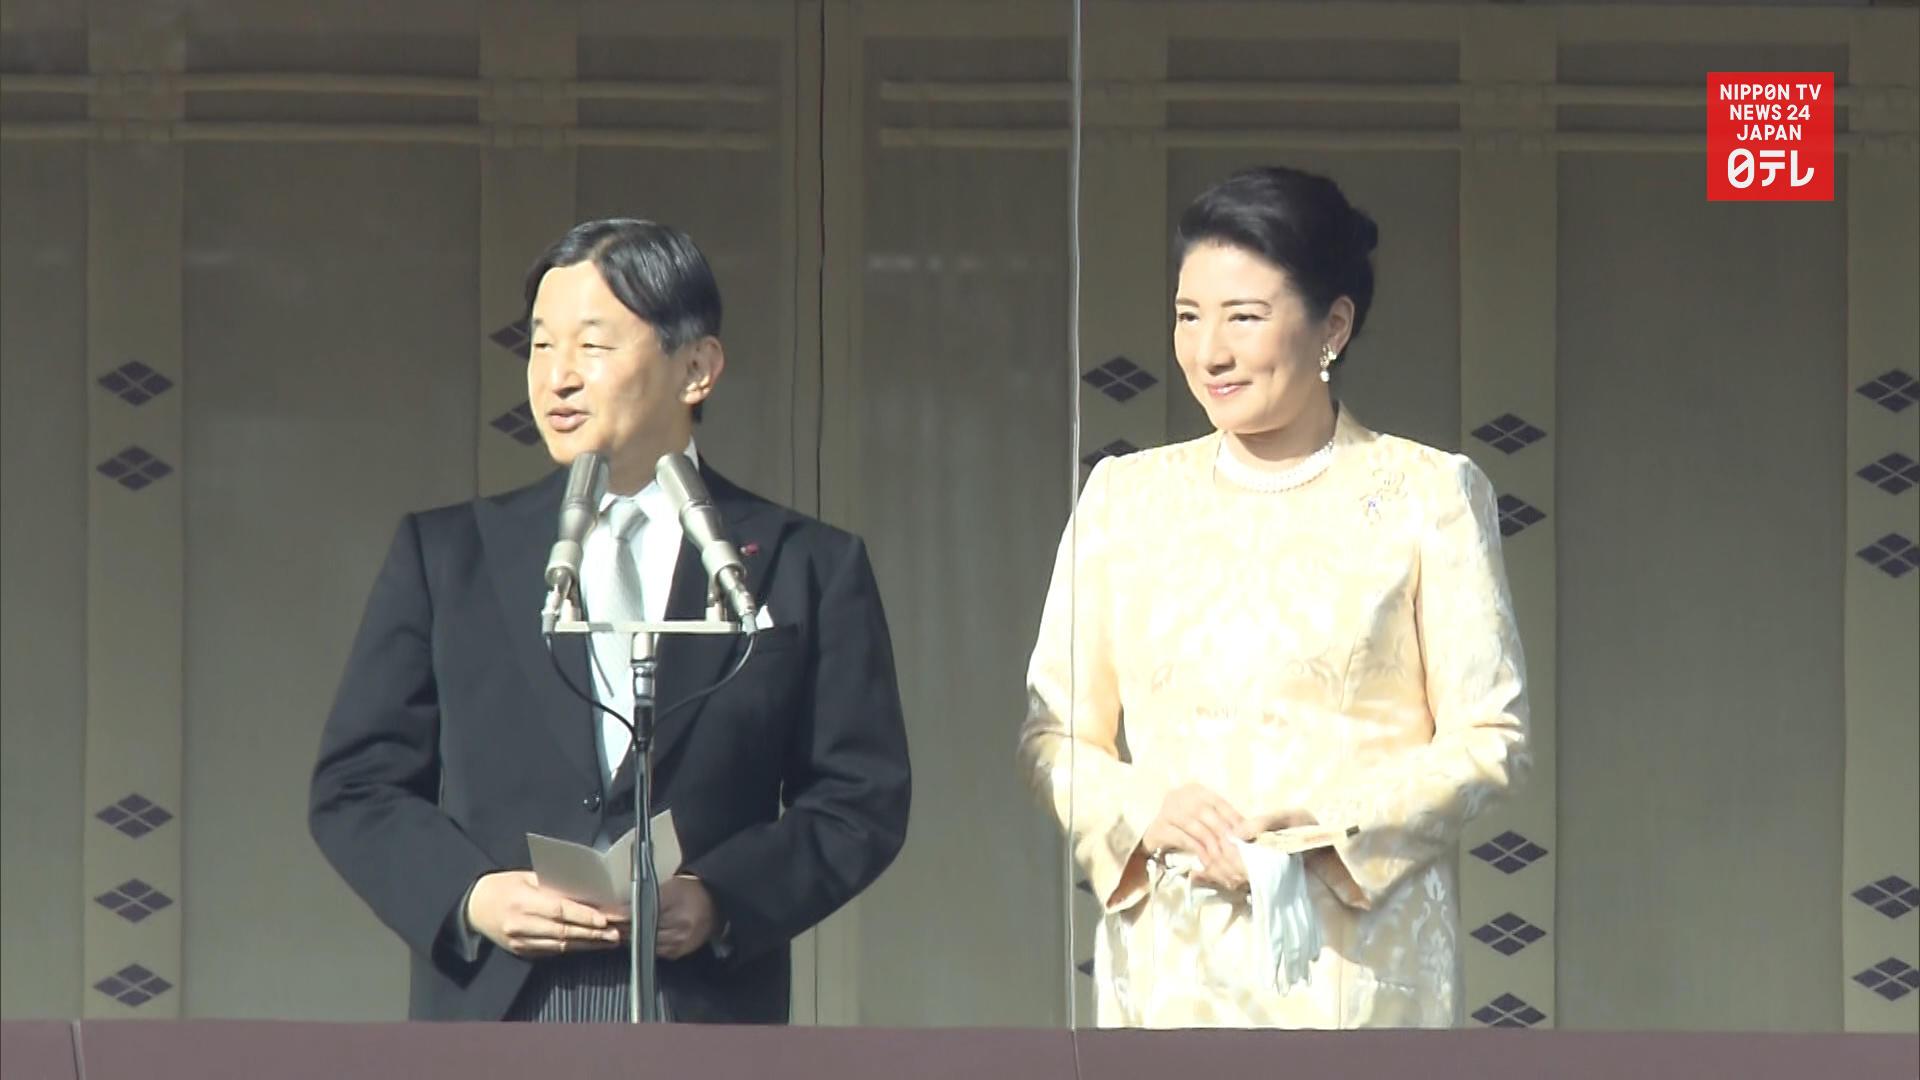 CORONAVIRUS: Japan to postpone emperor's visit to UK